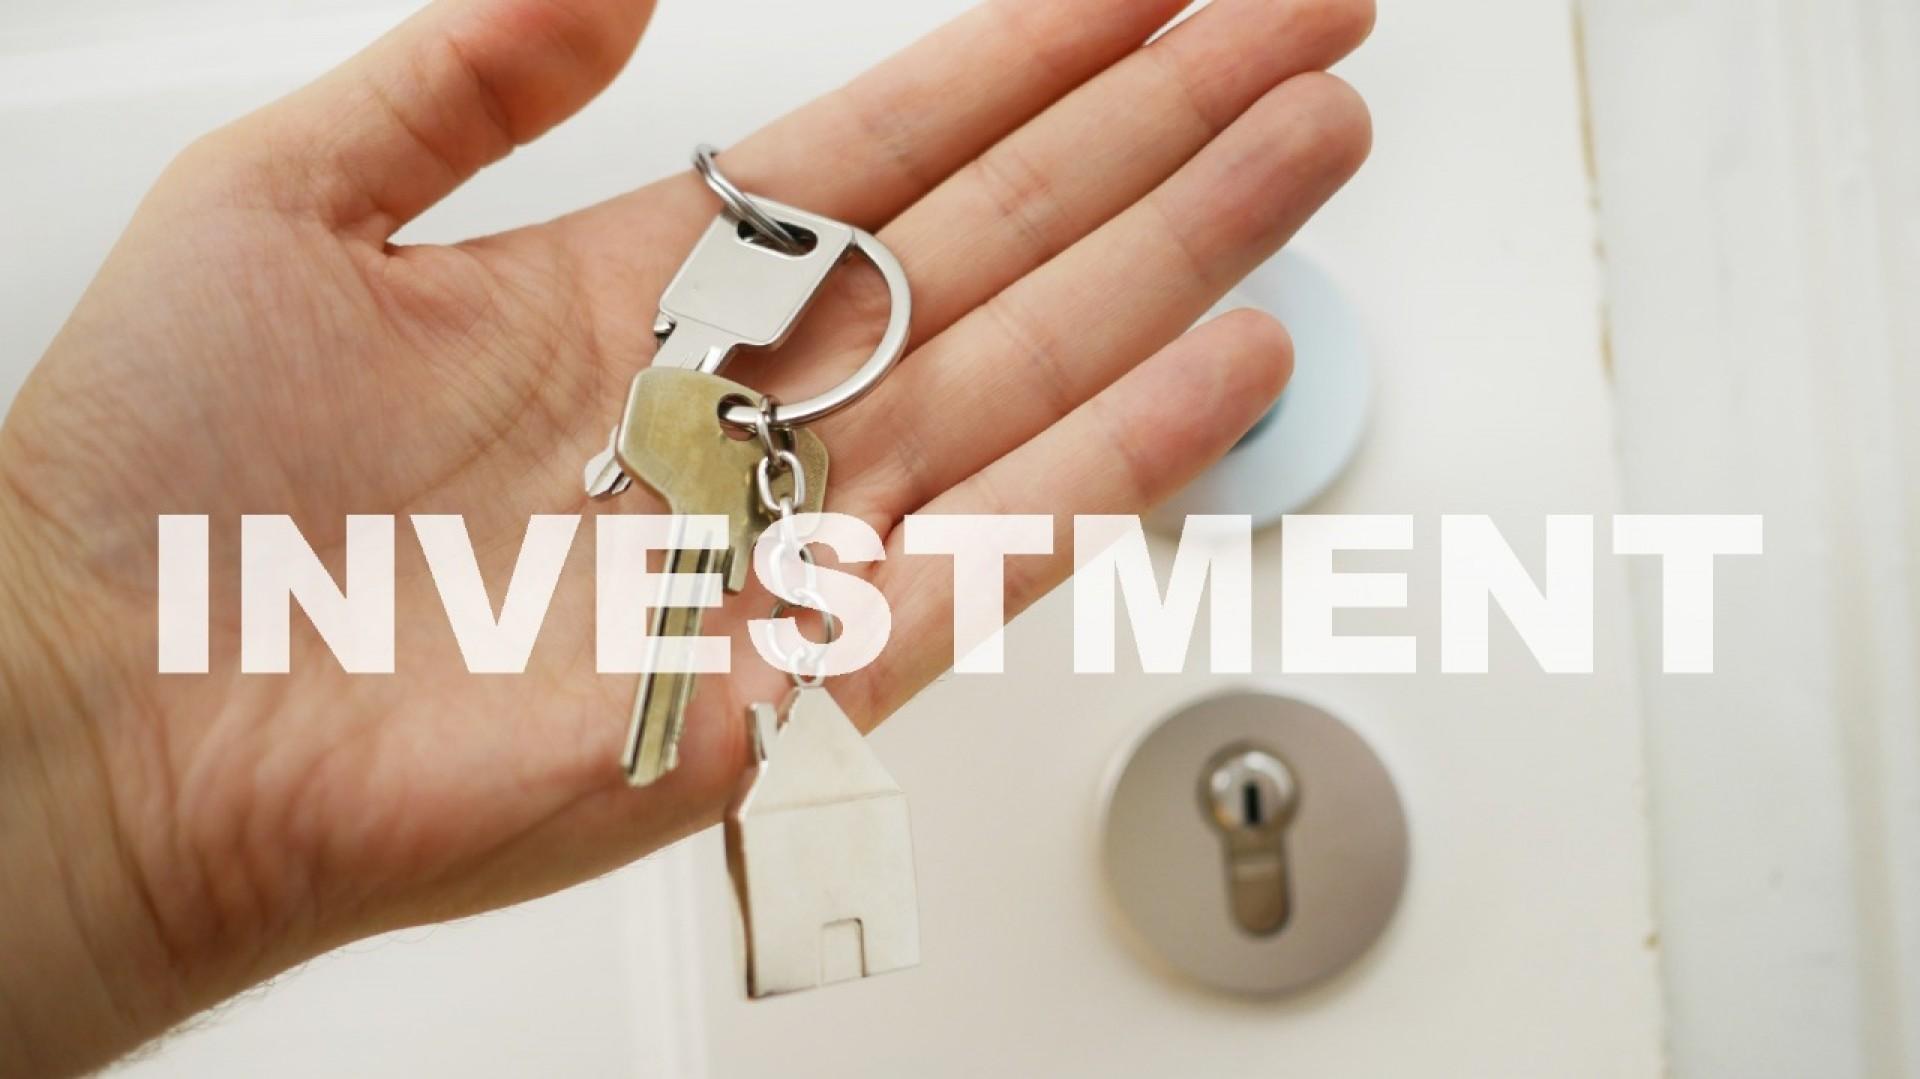 Aparkost Angkat Minat Investasi Para Investor